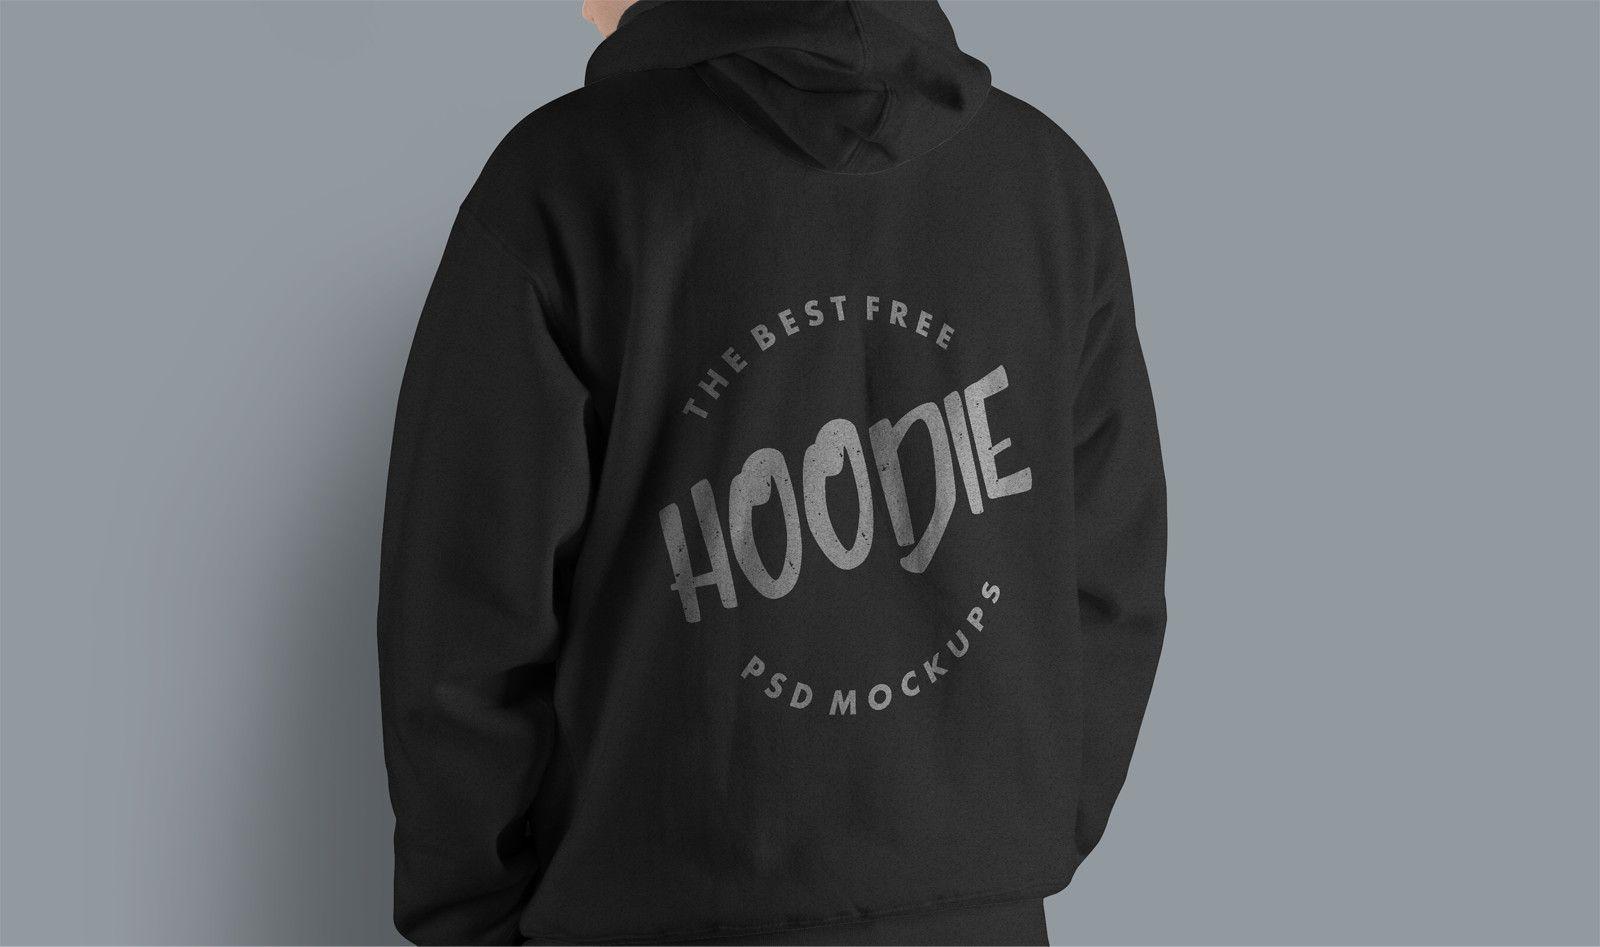 Download The Best Free Psd Hoodie Mockups Hipsthetic Hoodie Mockup Hoodie Mockup Free Mockup Psd